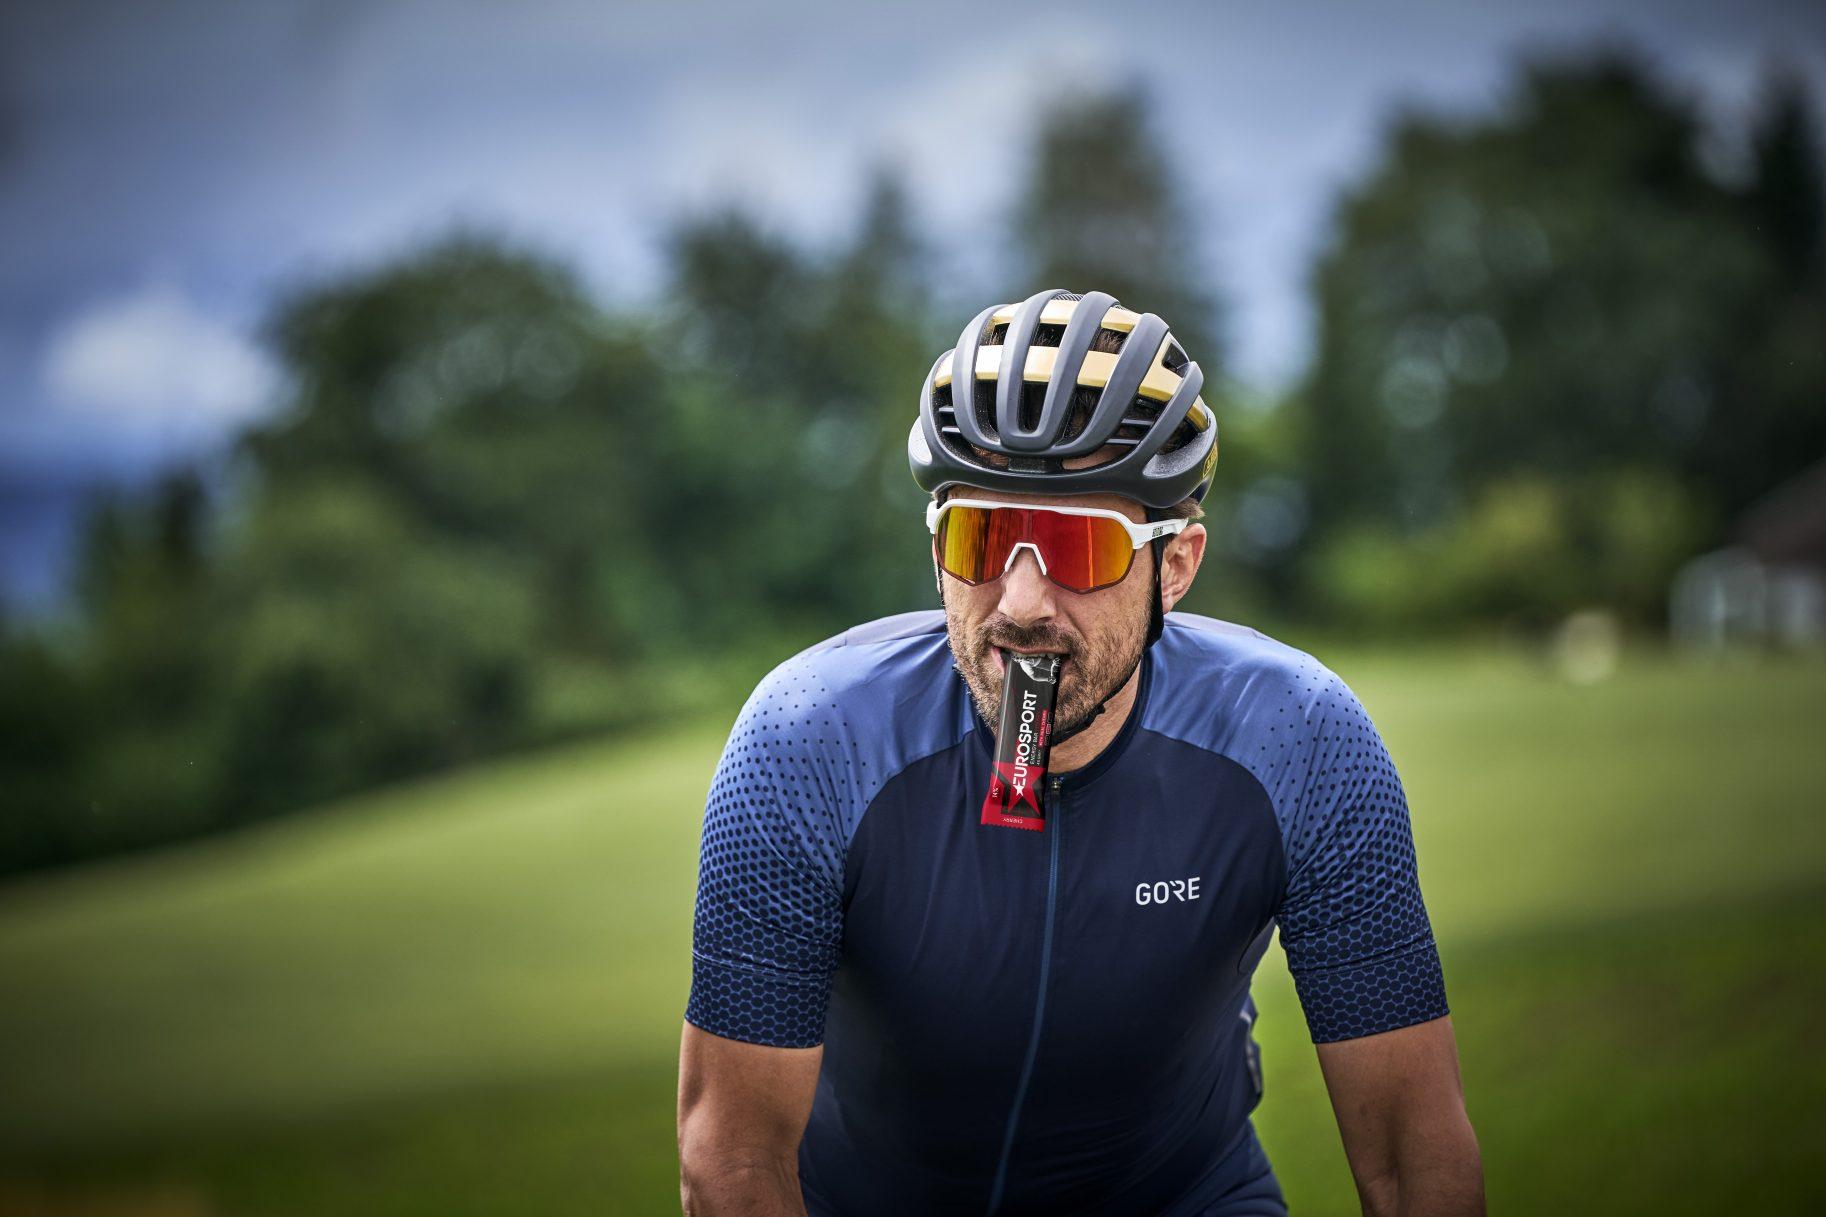 Fabian Cancellara, Eurosport